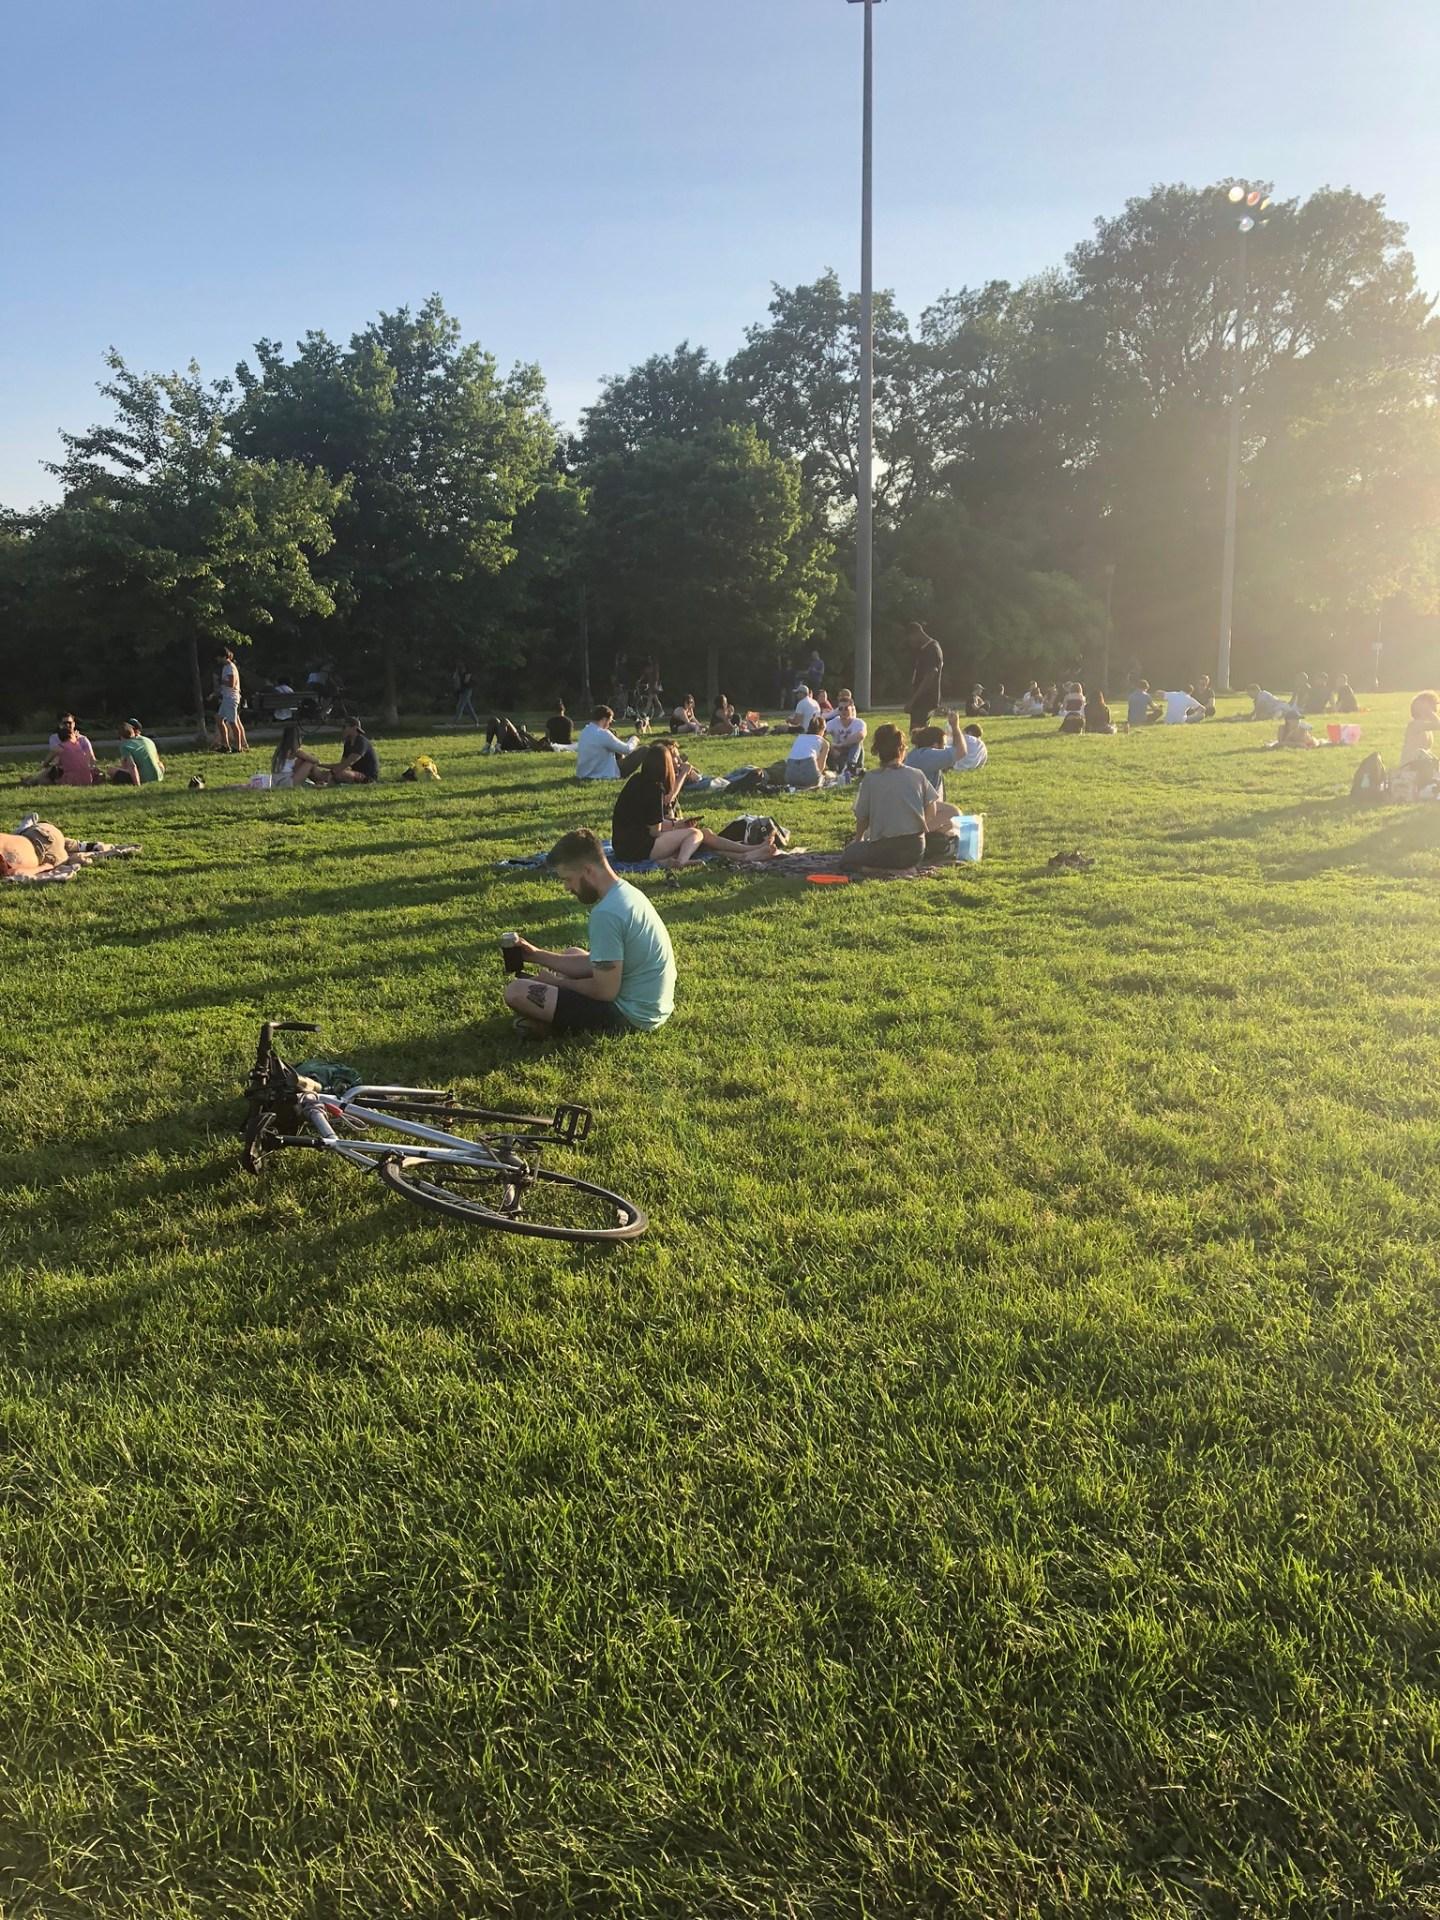 Summer in Toronto: Drinking in Trinity Bellwoods